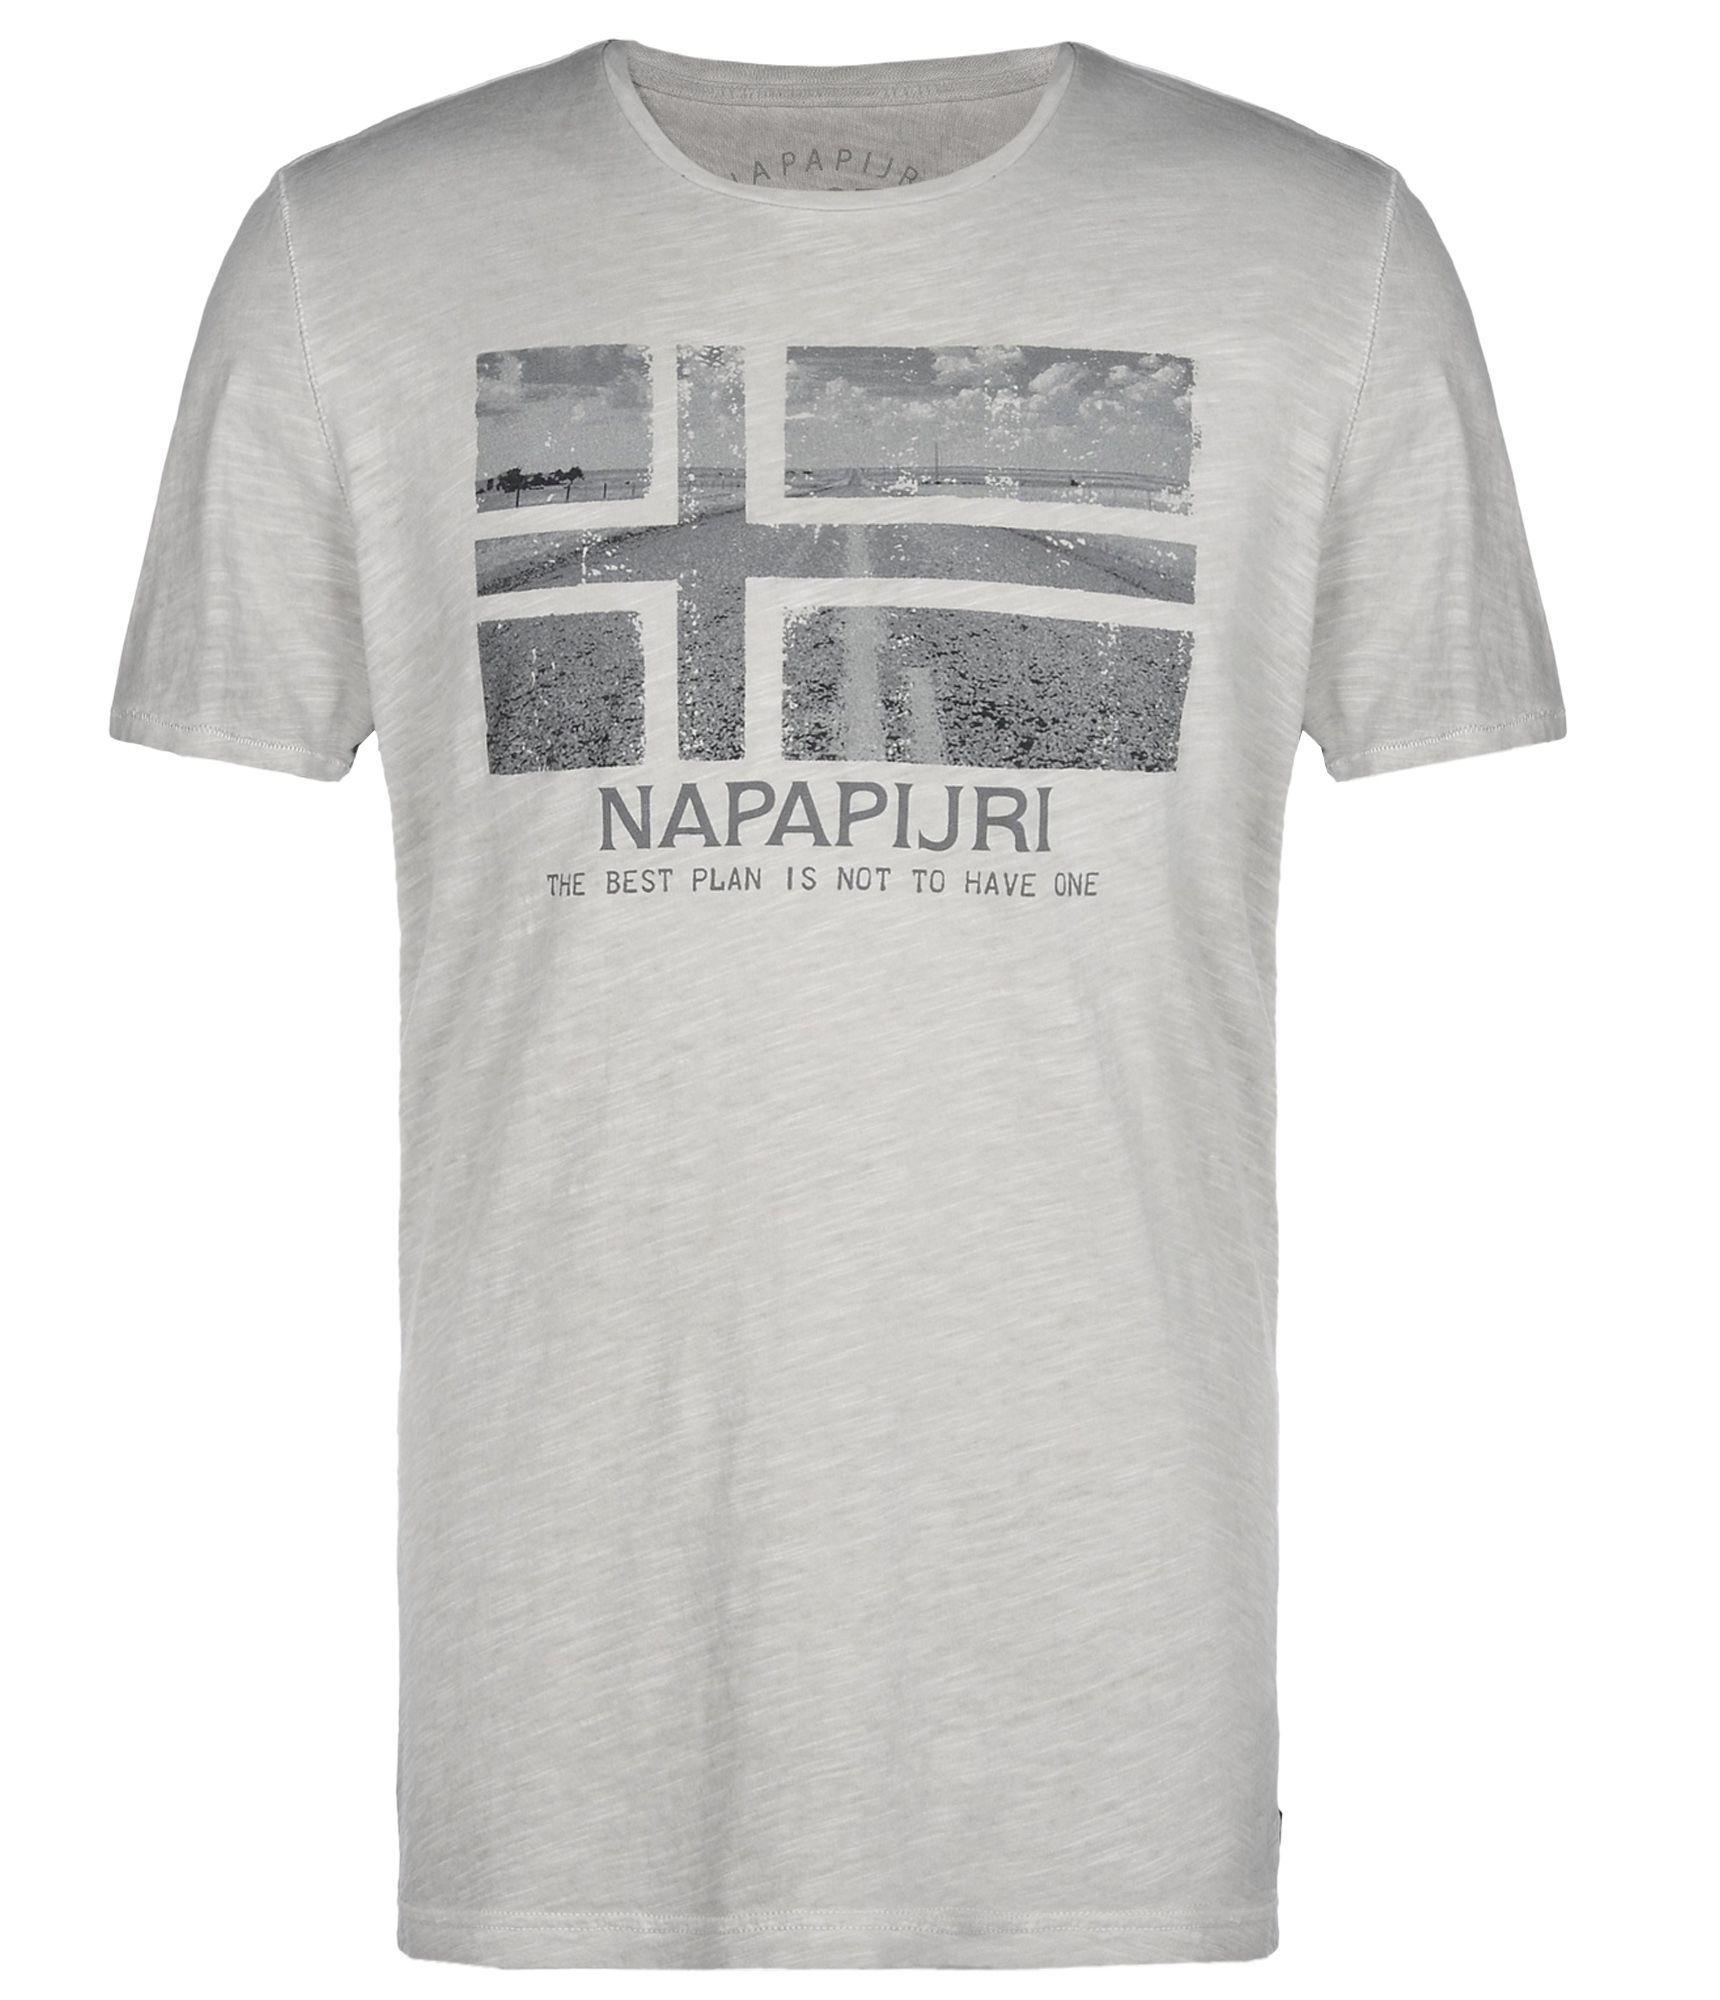 napapijri short sleeve t shirt in gray for men grey lyst. Black Bedroom Furniture Sets. Home Design Ideas